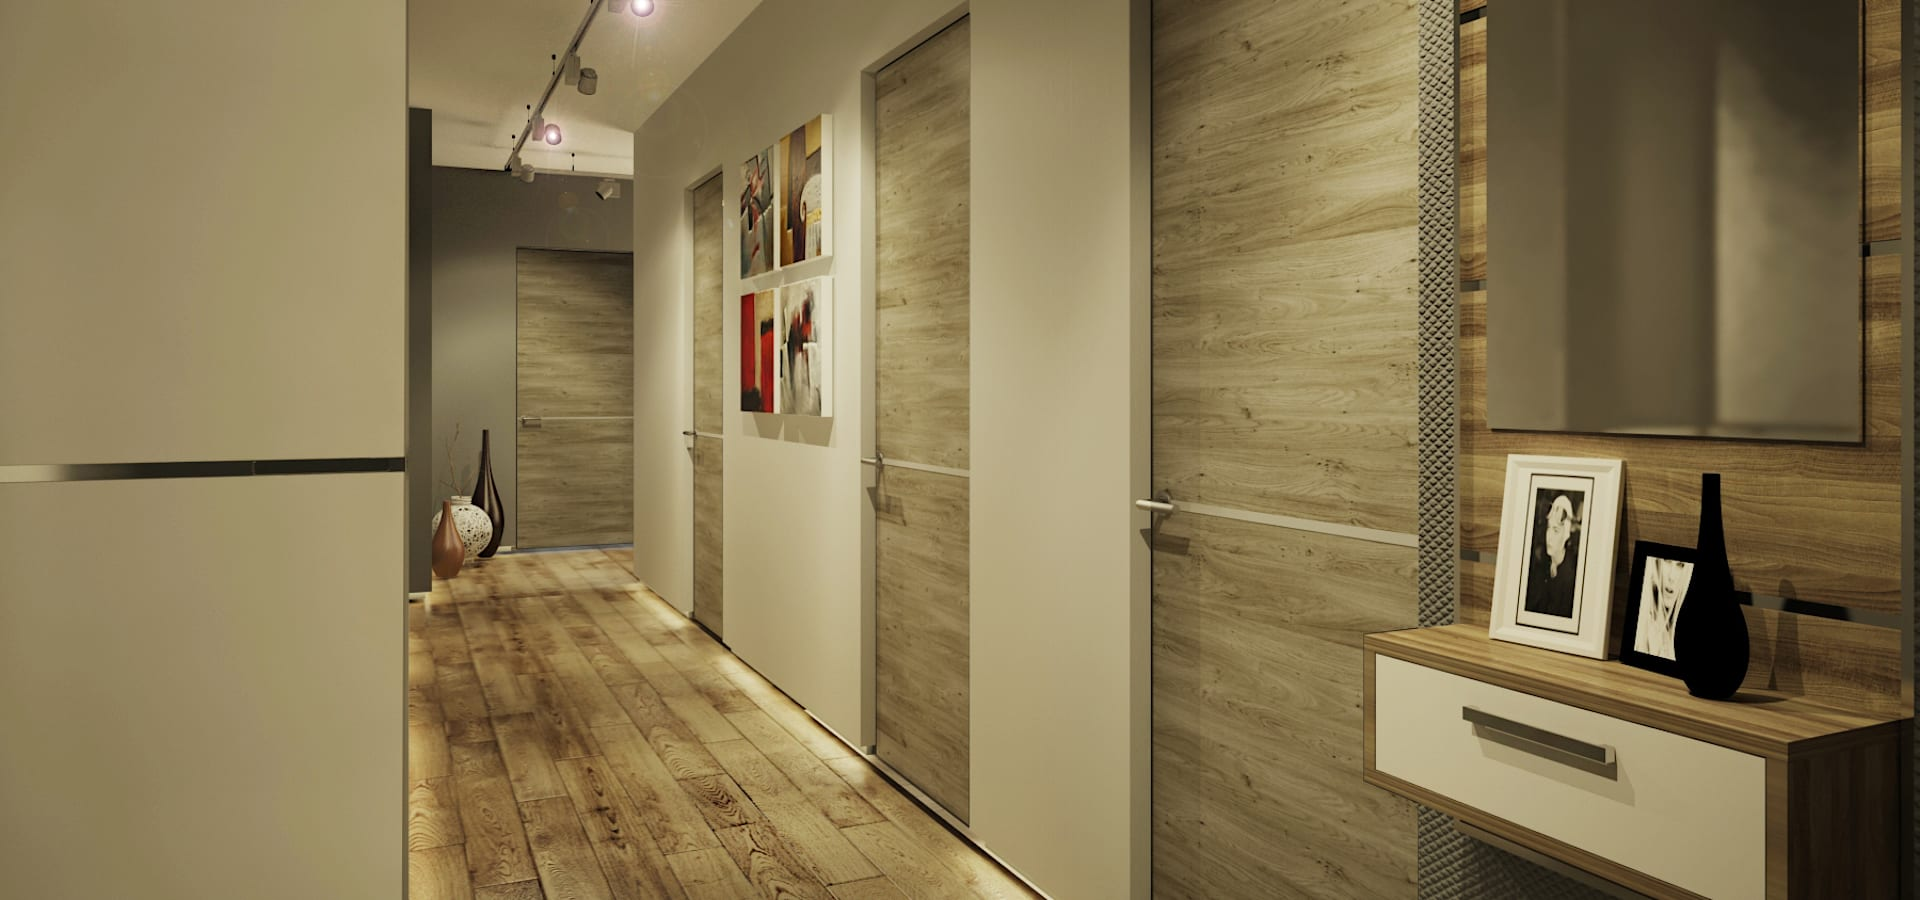 Polovets design studio